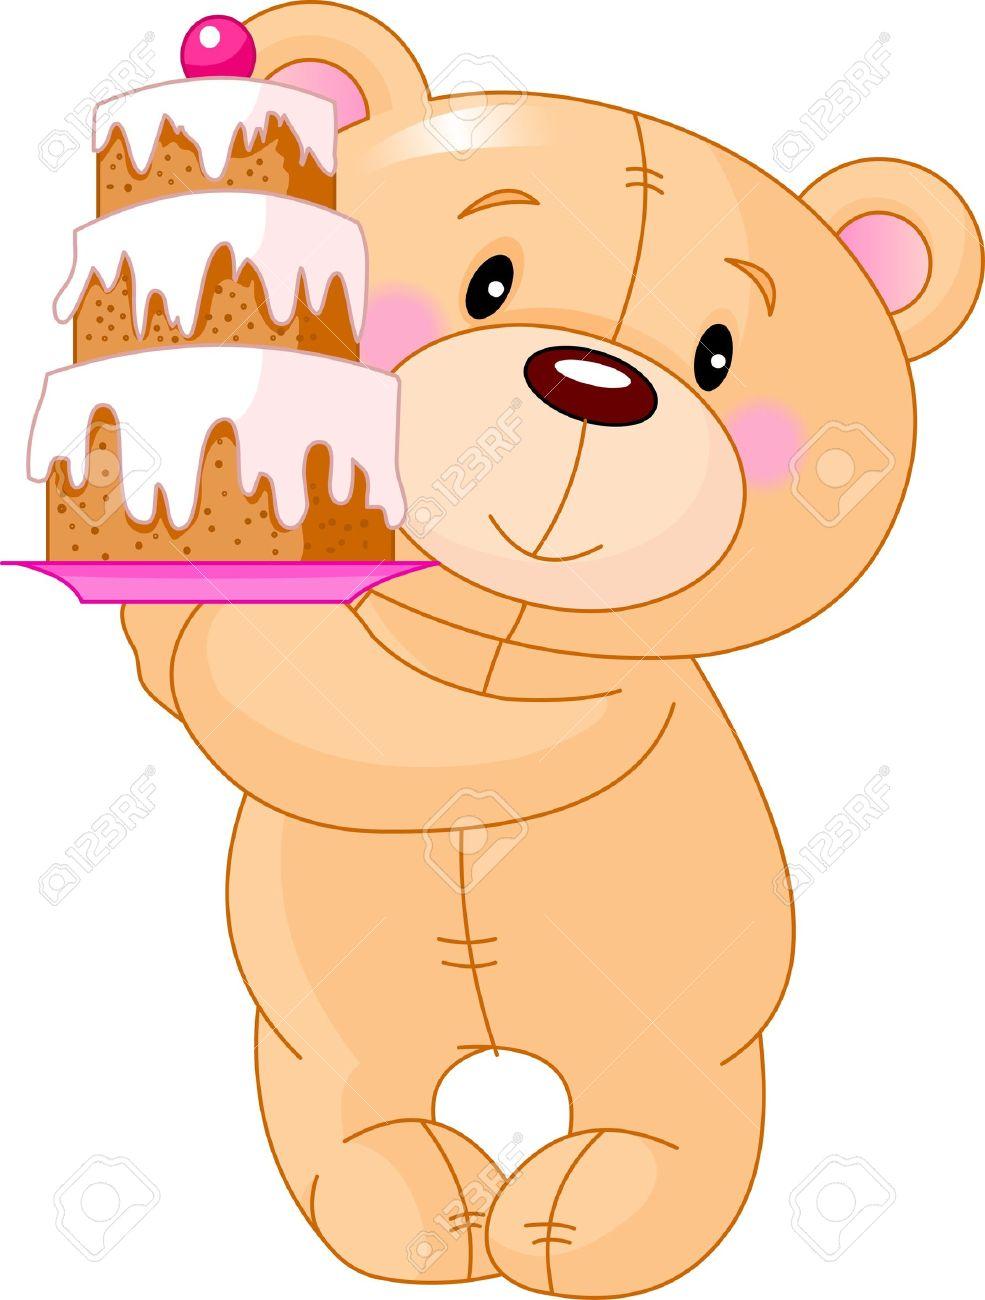 Illustration of cute Teddy Bear bringing birthday cake Stock Vector - 7822800